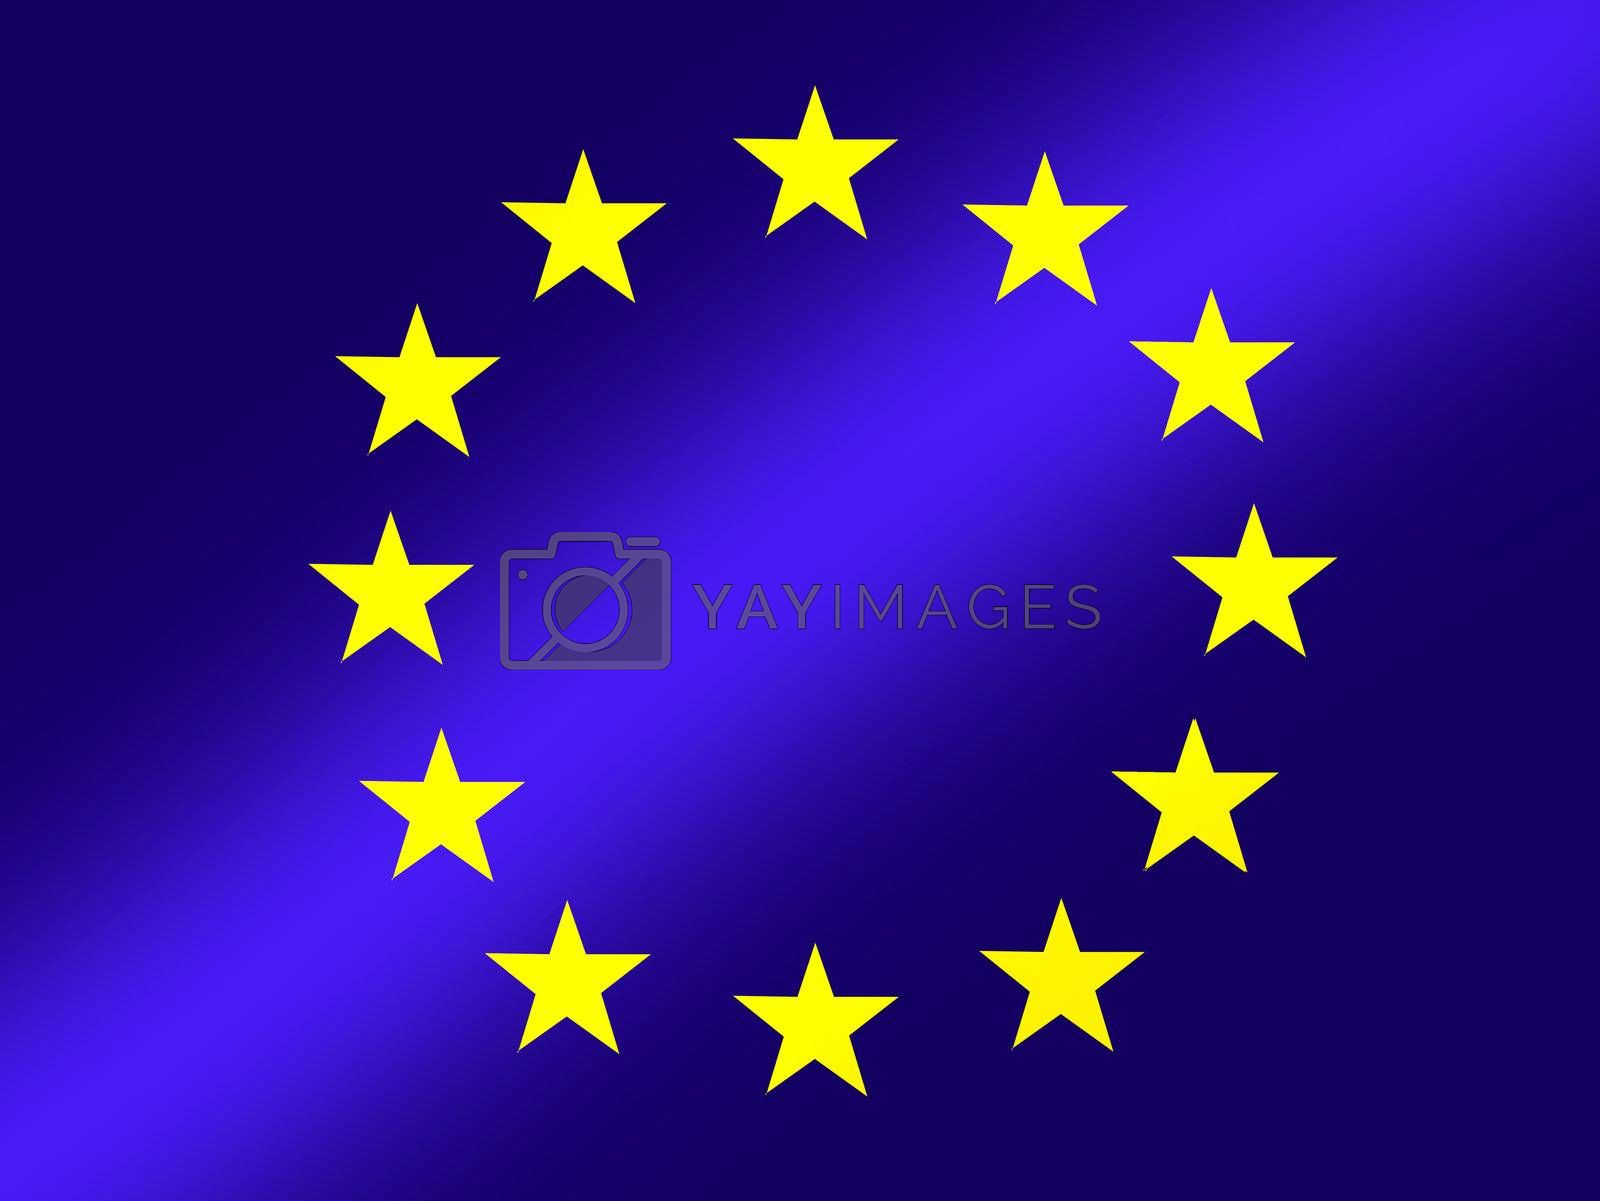 european union, blue flag with yellow stars